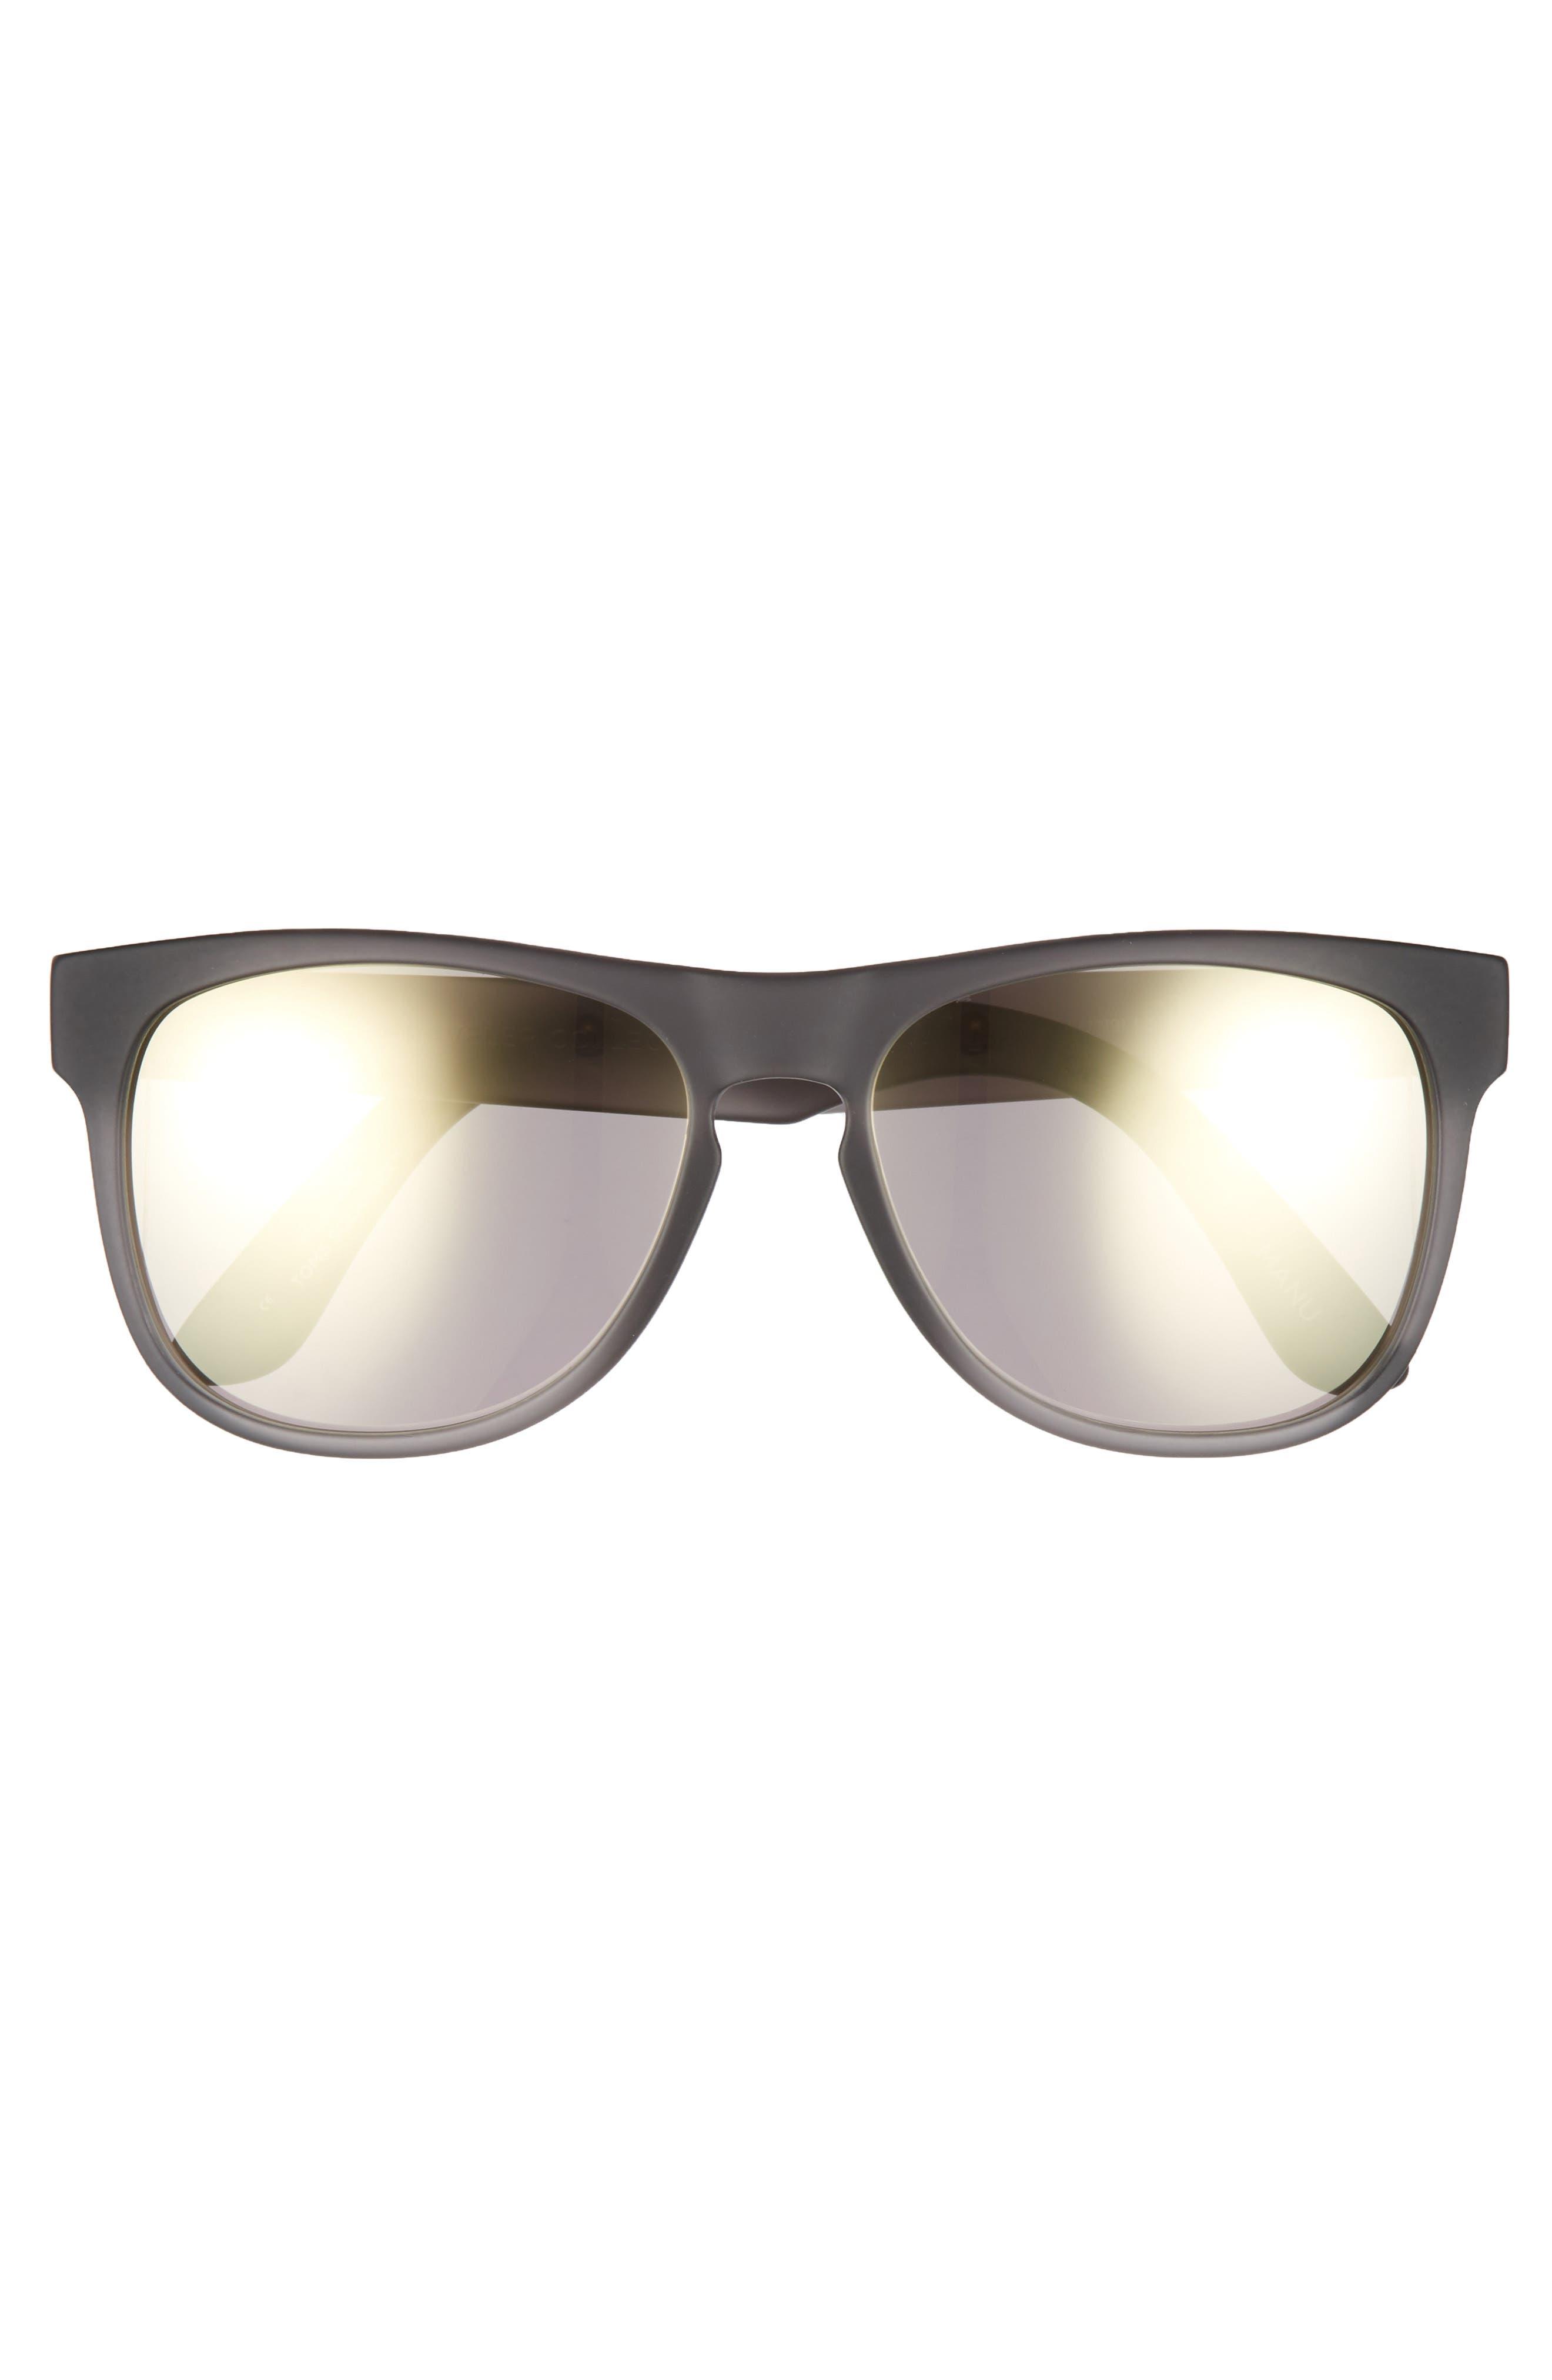 Manu 57mm Sunglasses,                             Alternate thumbnail 2, color,                             PEWTER